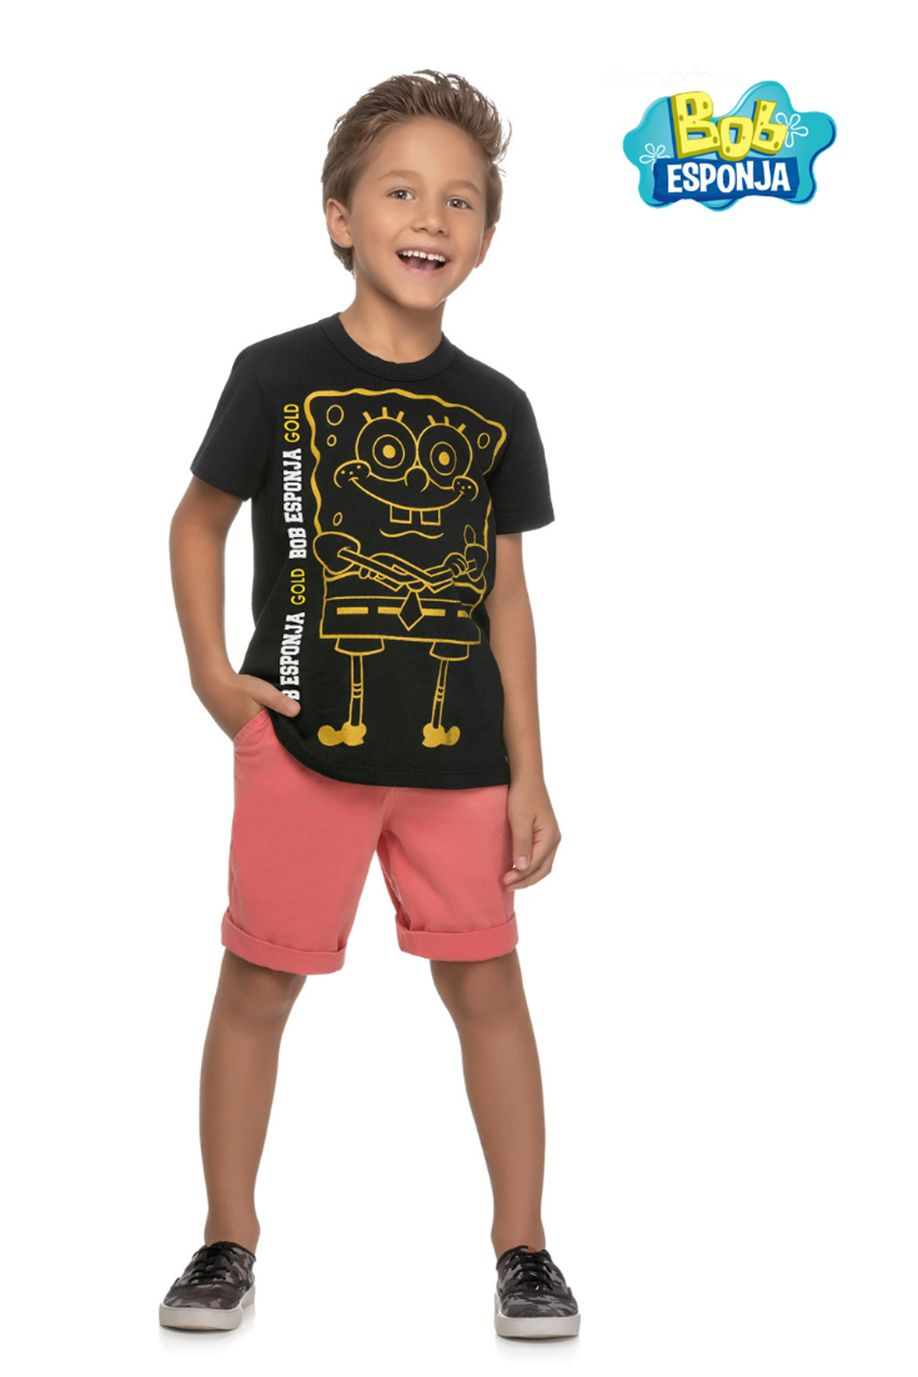 Camiseta Bob Esponja infantil REF. 84015